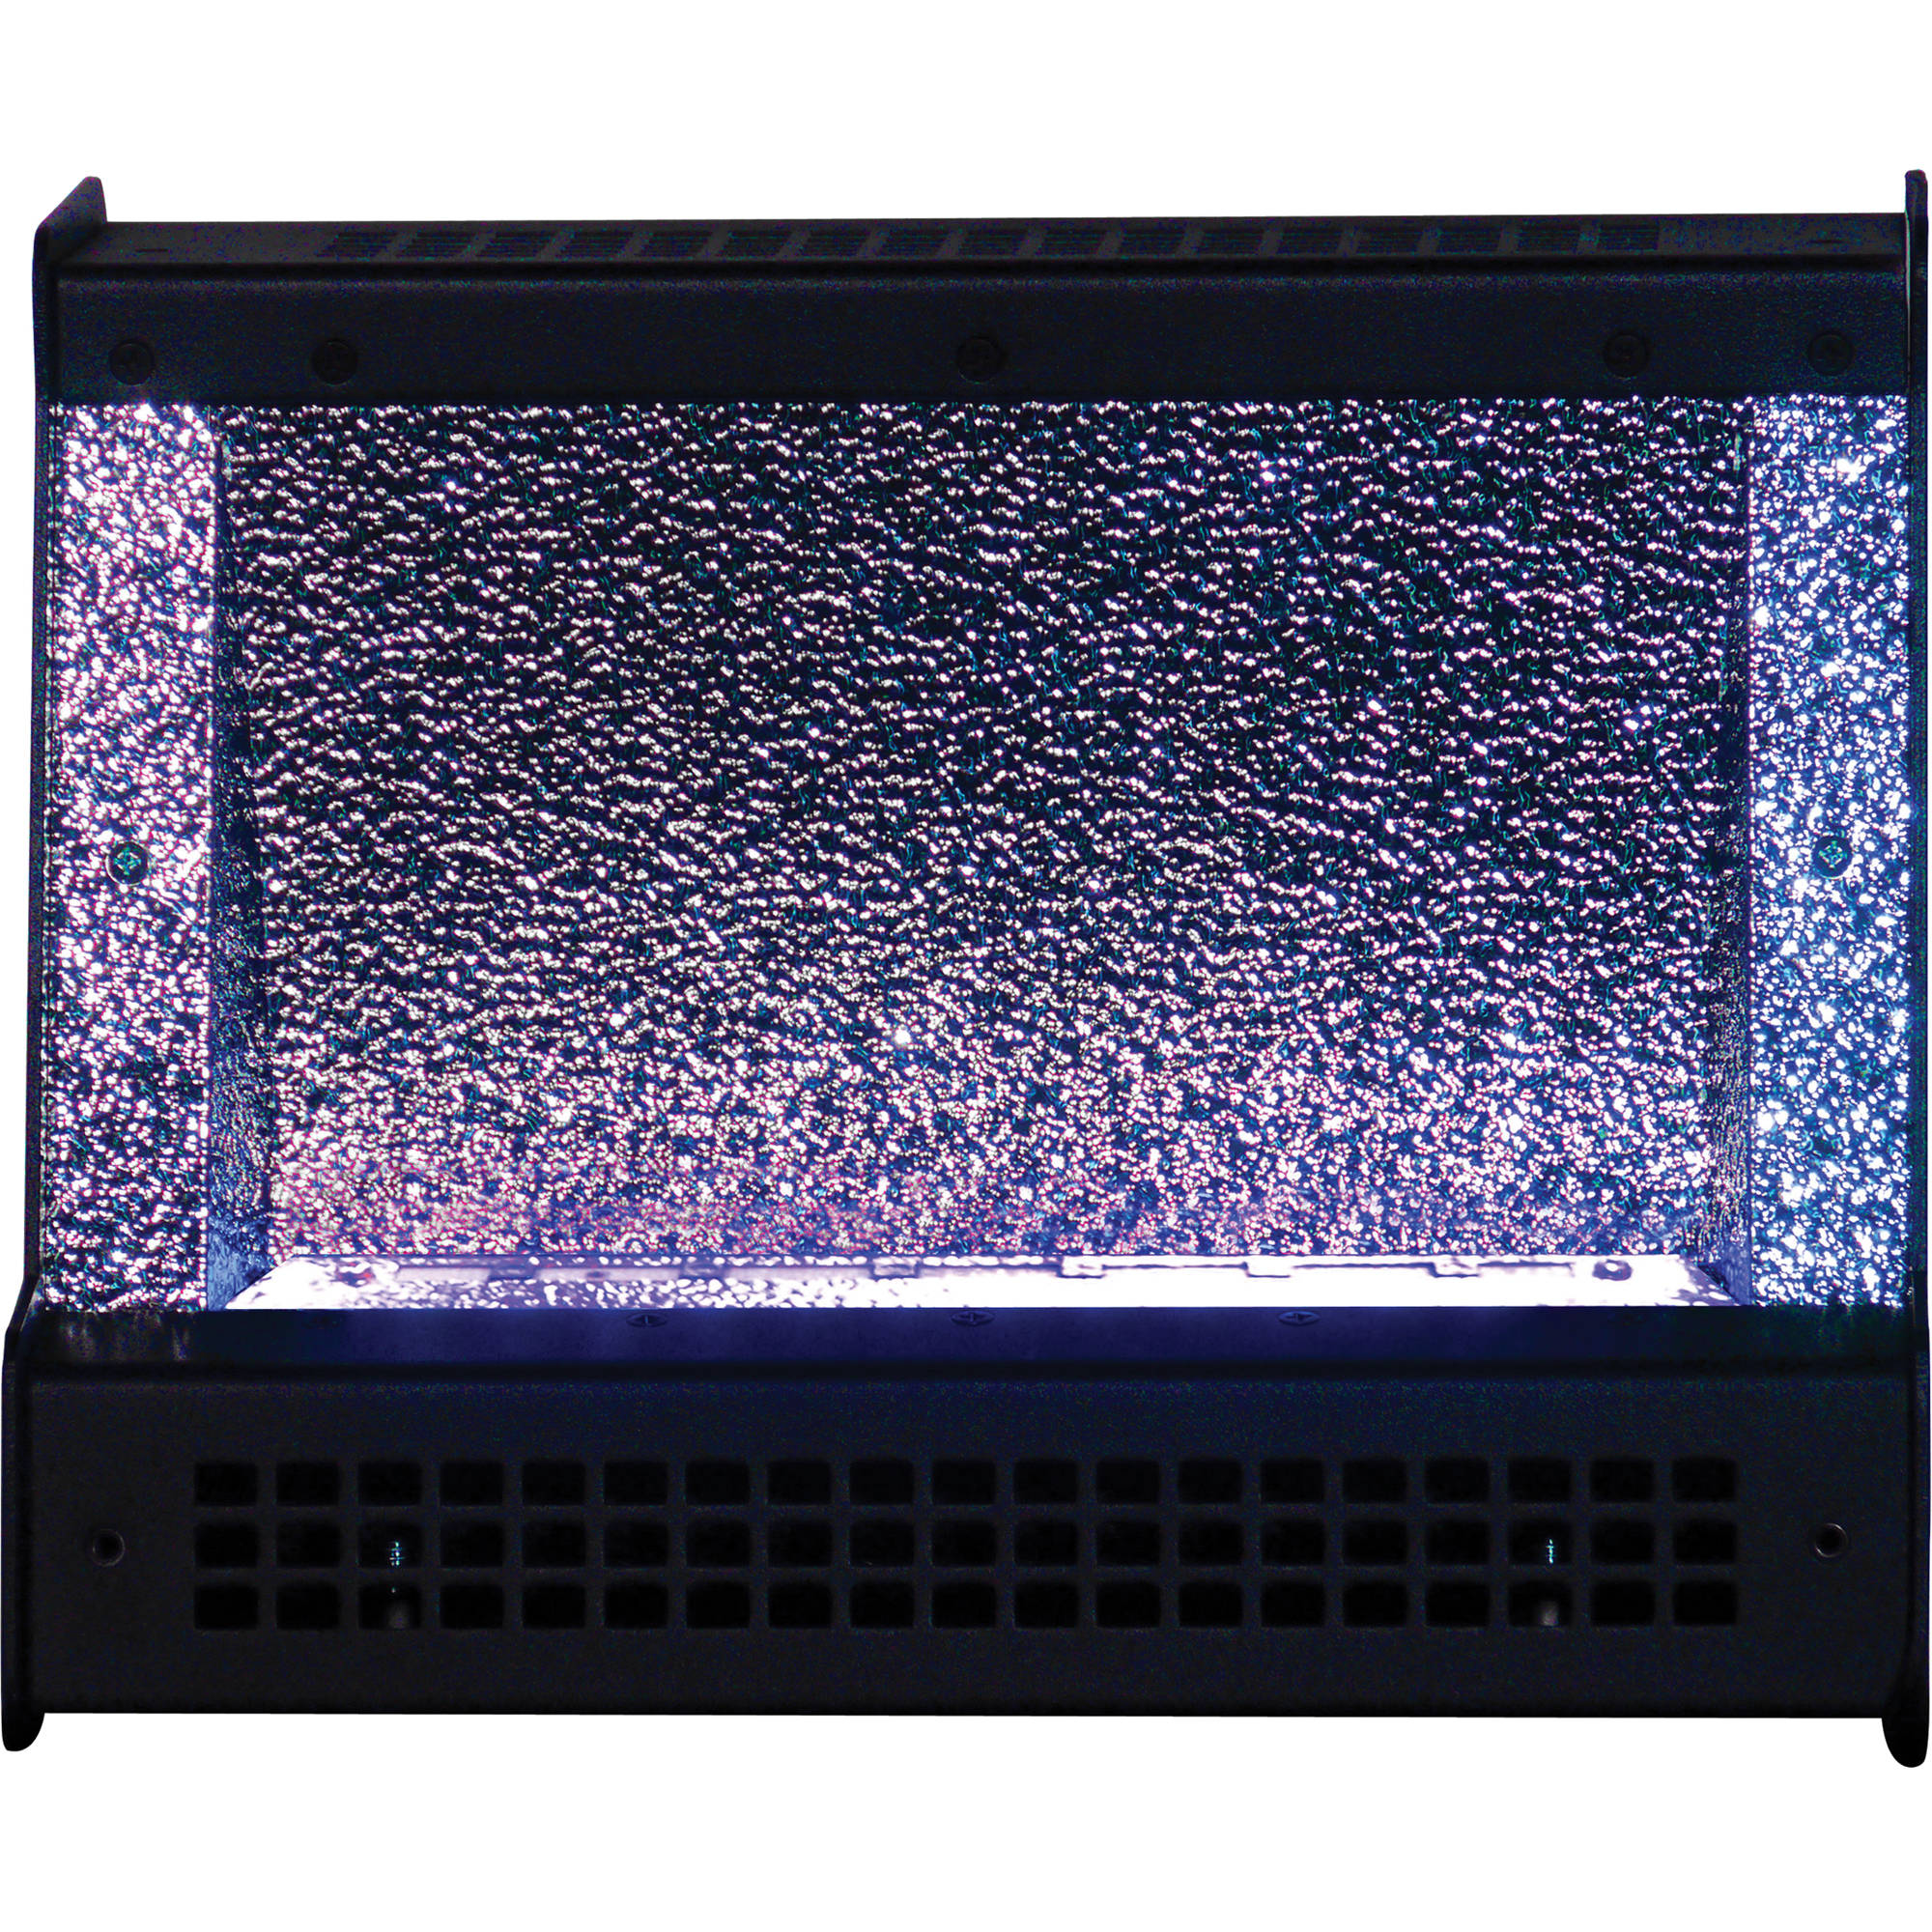 Altman Spectra Cyc 100w Led Blacklight Black Sscyc100 Uv